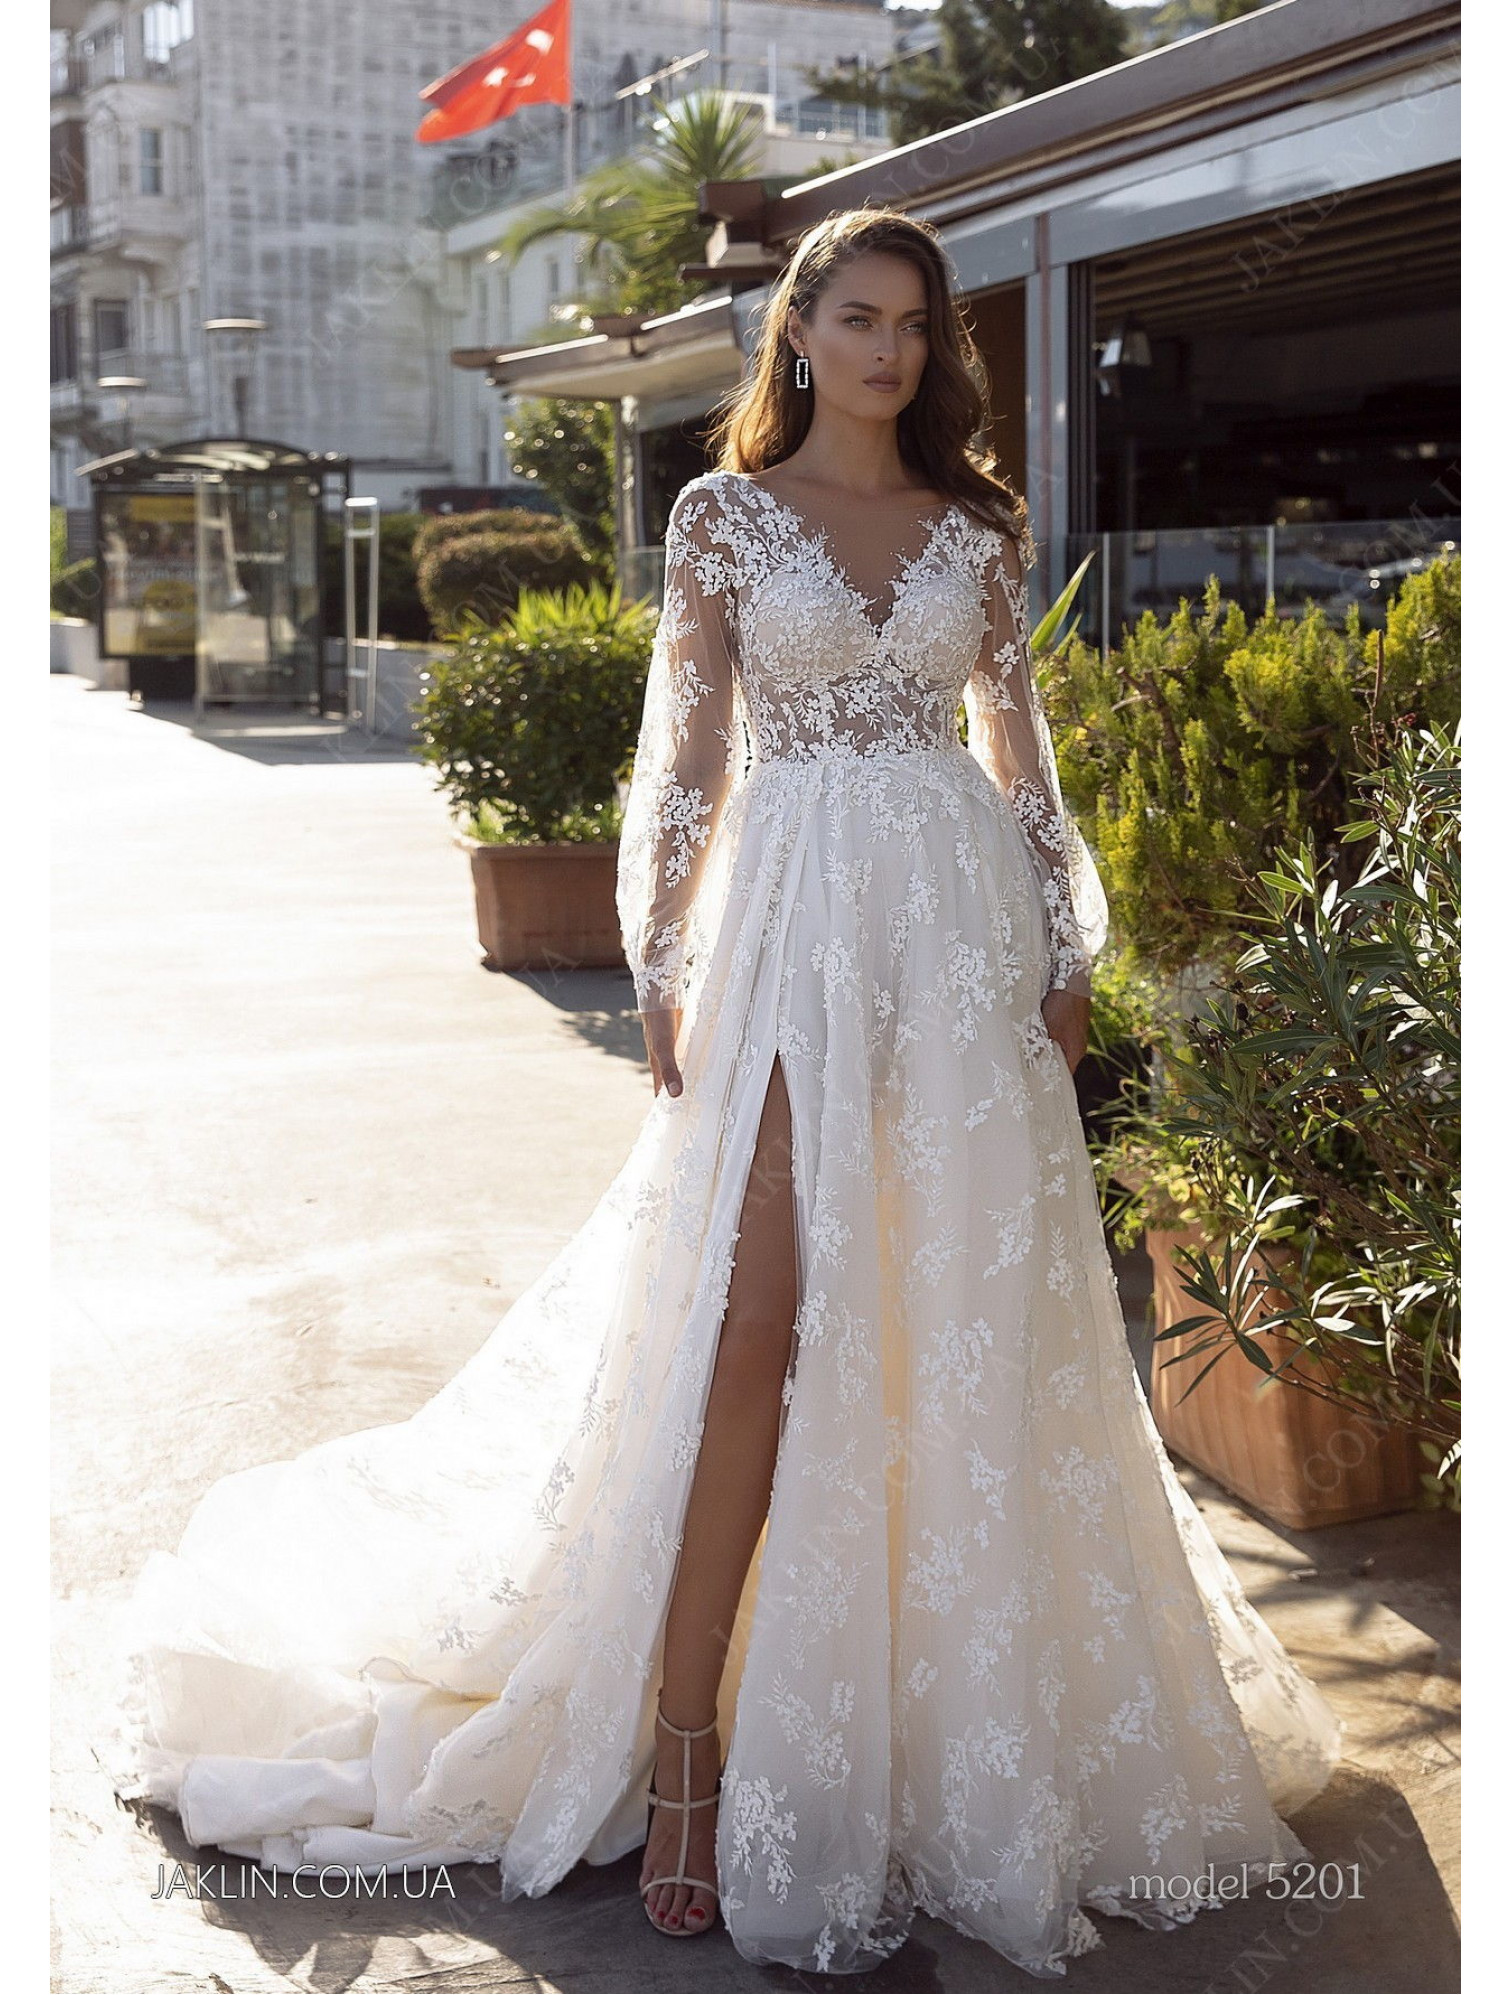 Wedding dress 5201